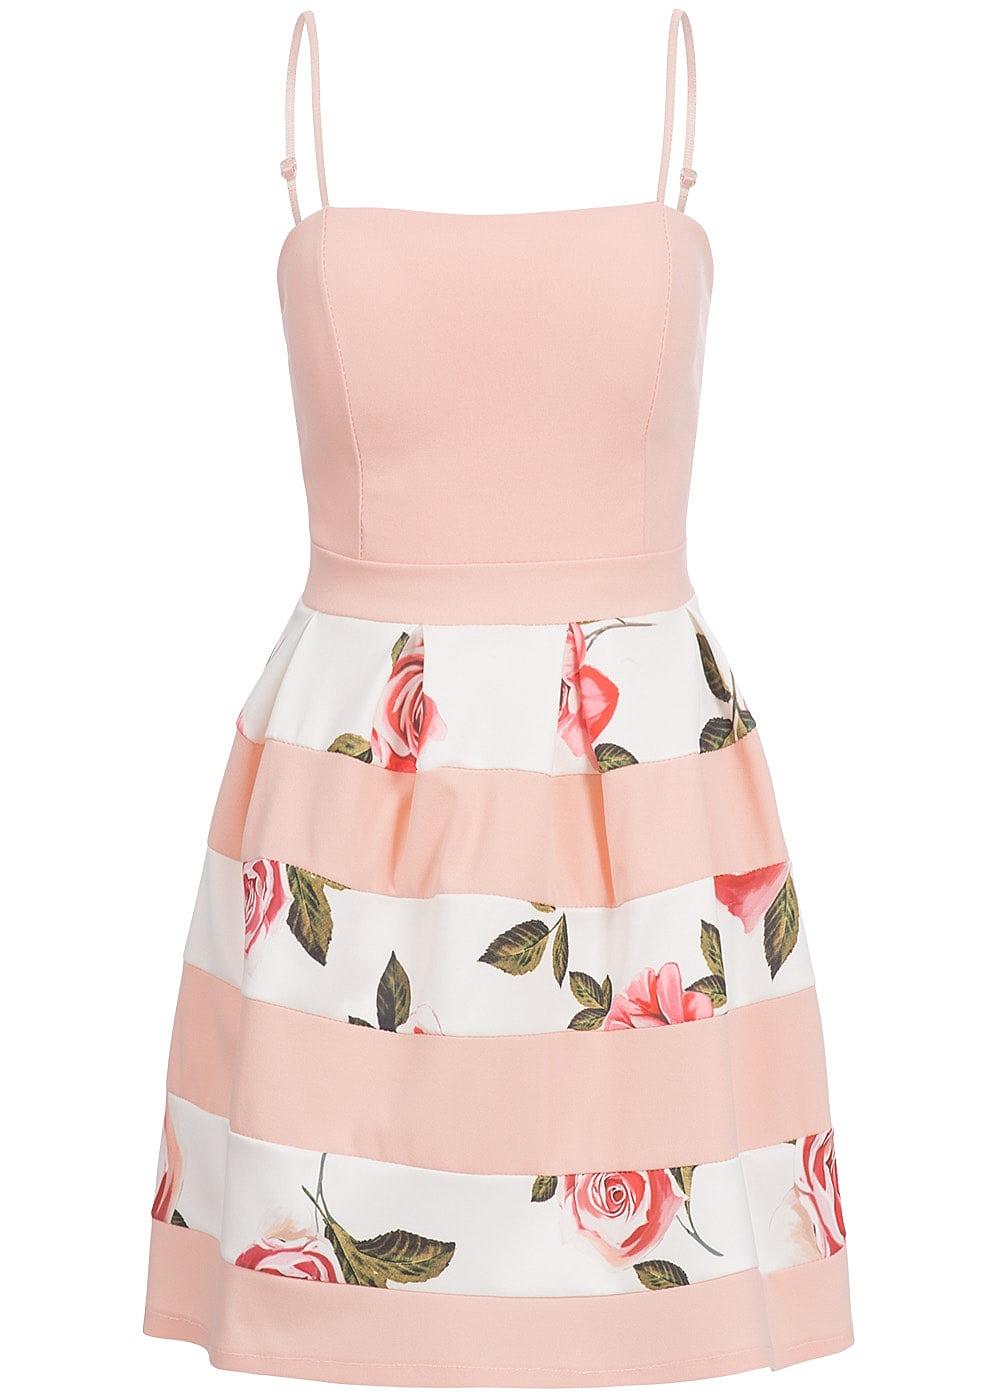 fcfb772cfe1c35 Styleboom Fashion Damen Kleid Rosen Print rosa weiss - 77onlineshop